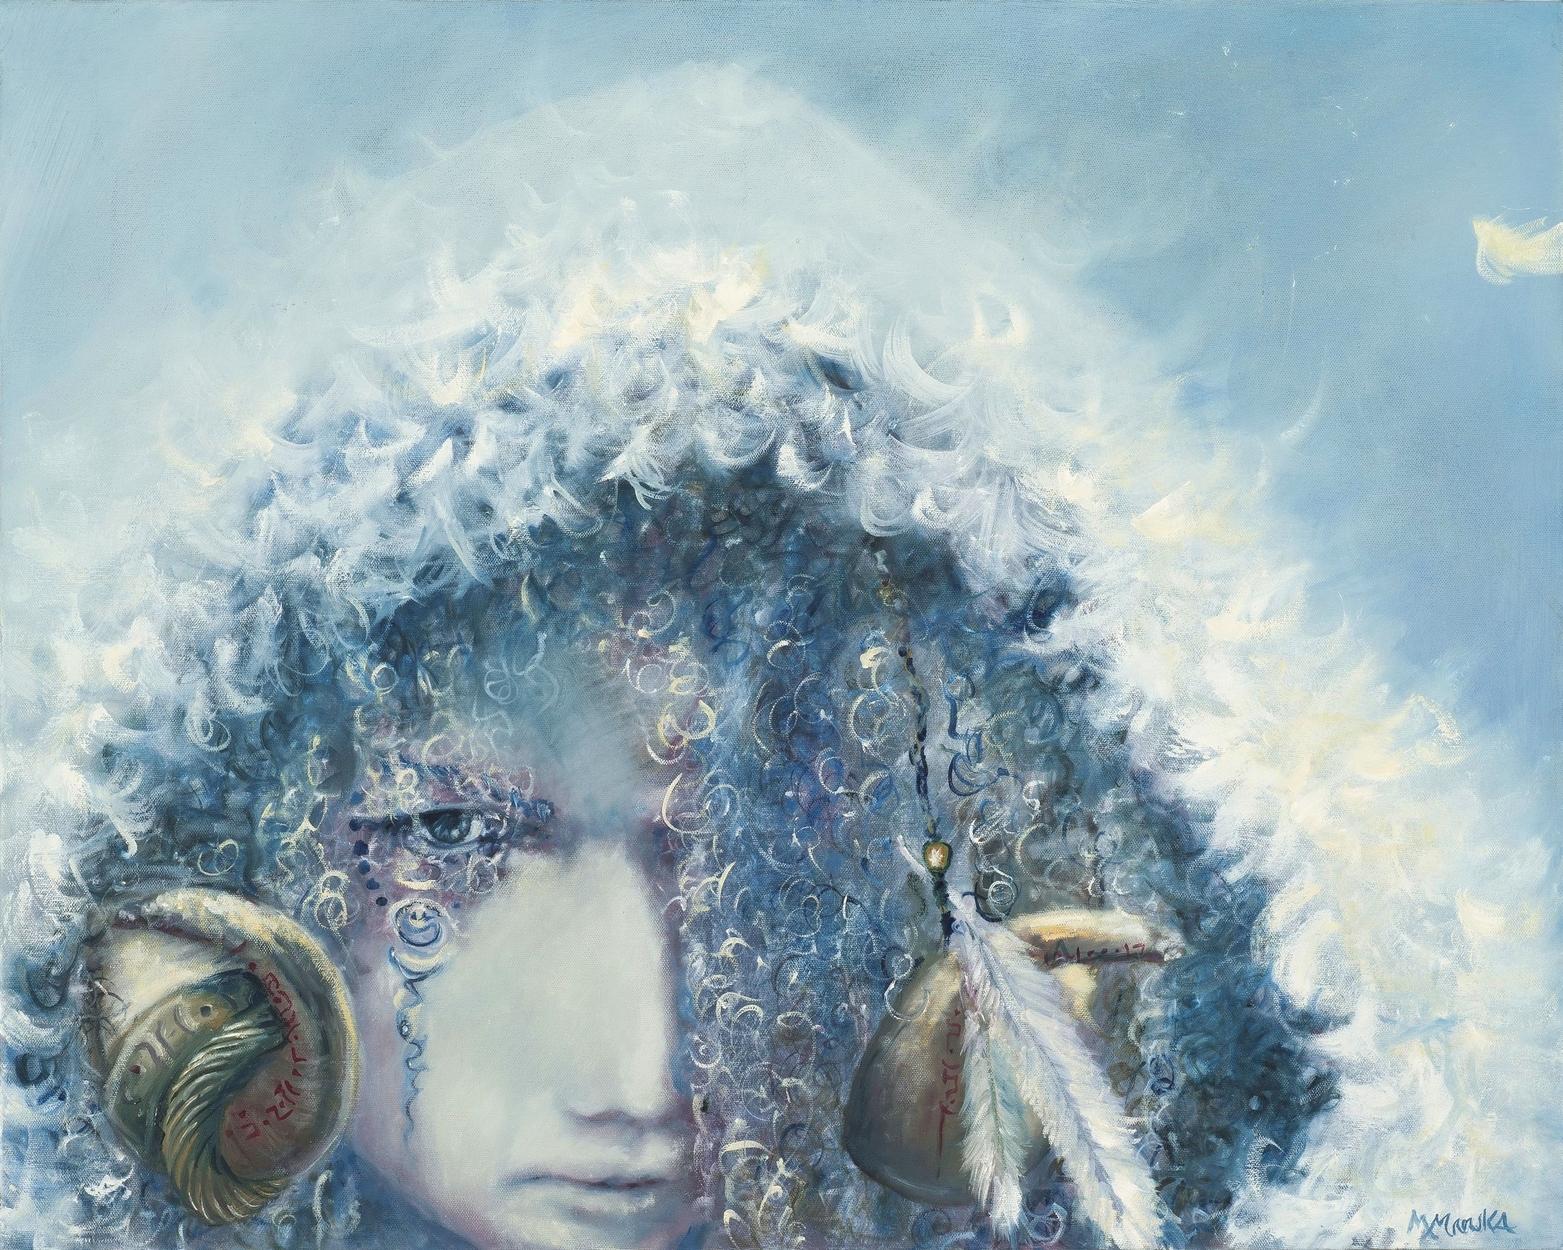 Yeti Artwork by michelle mrowka